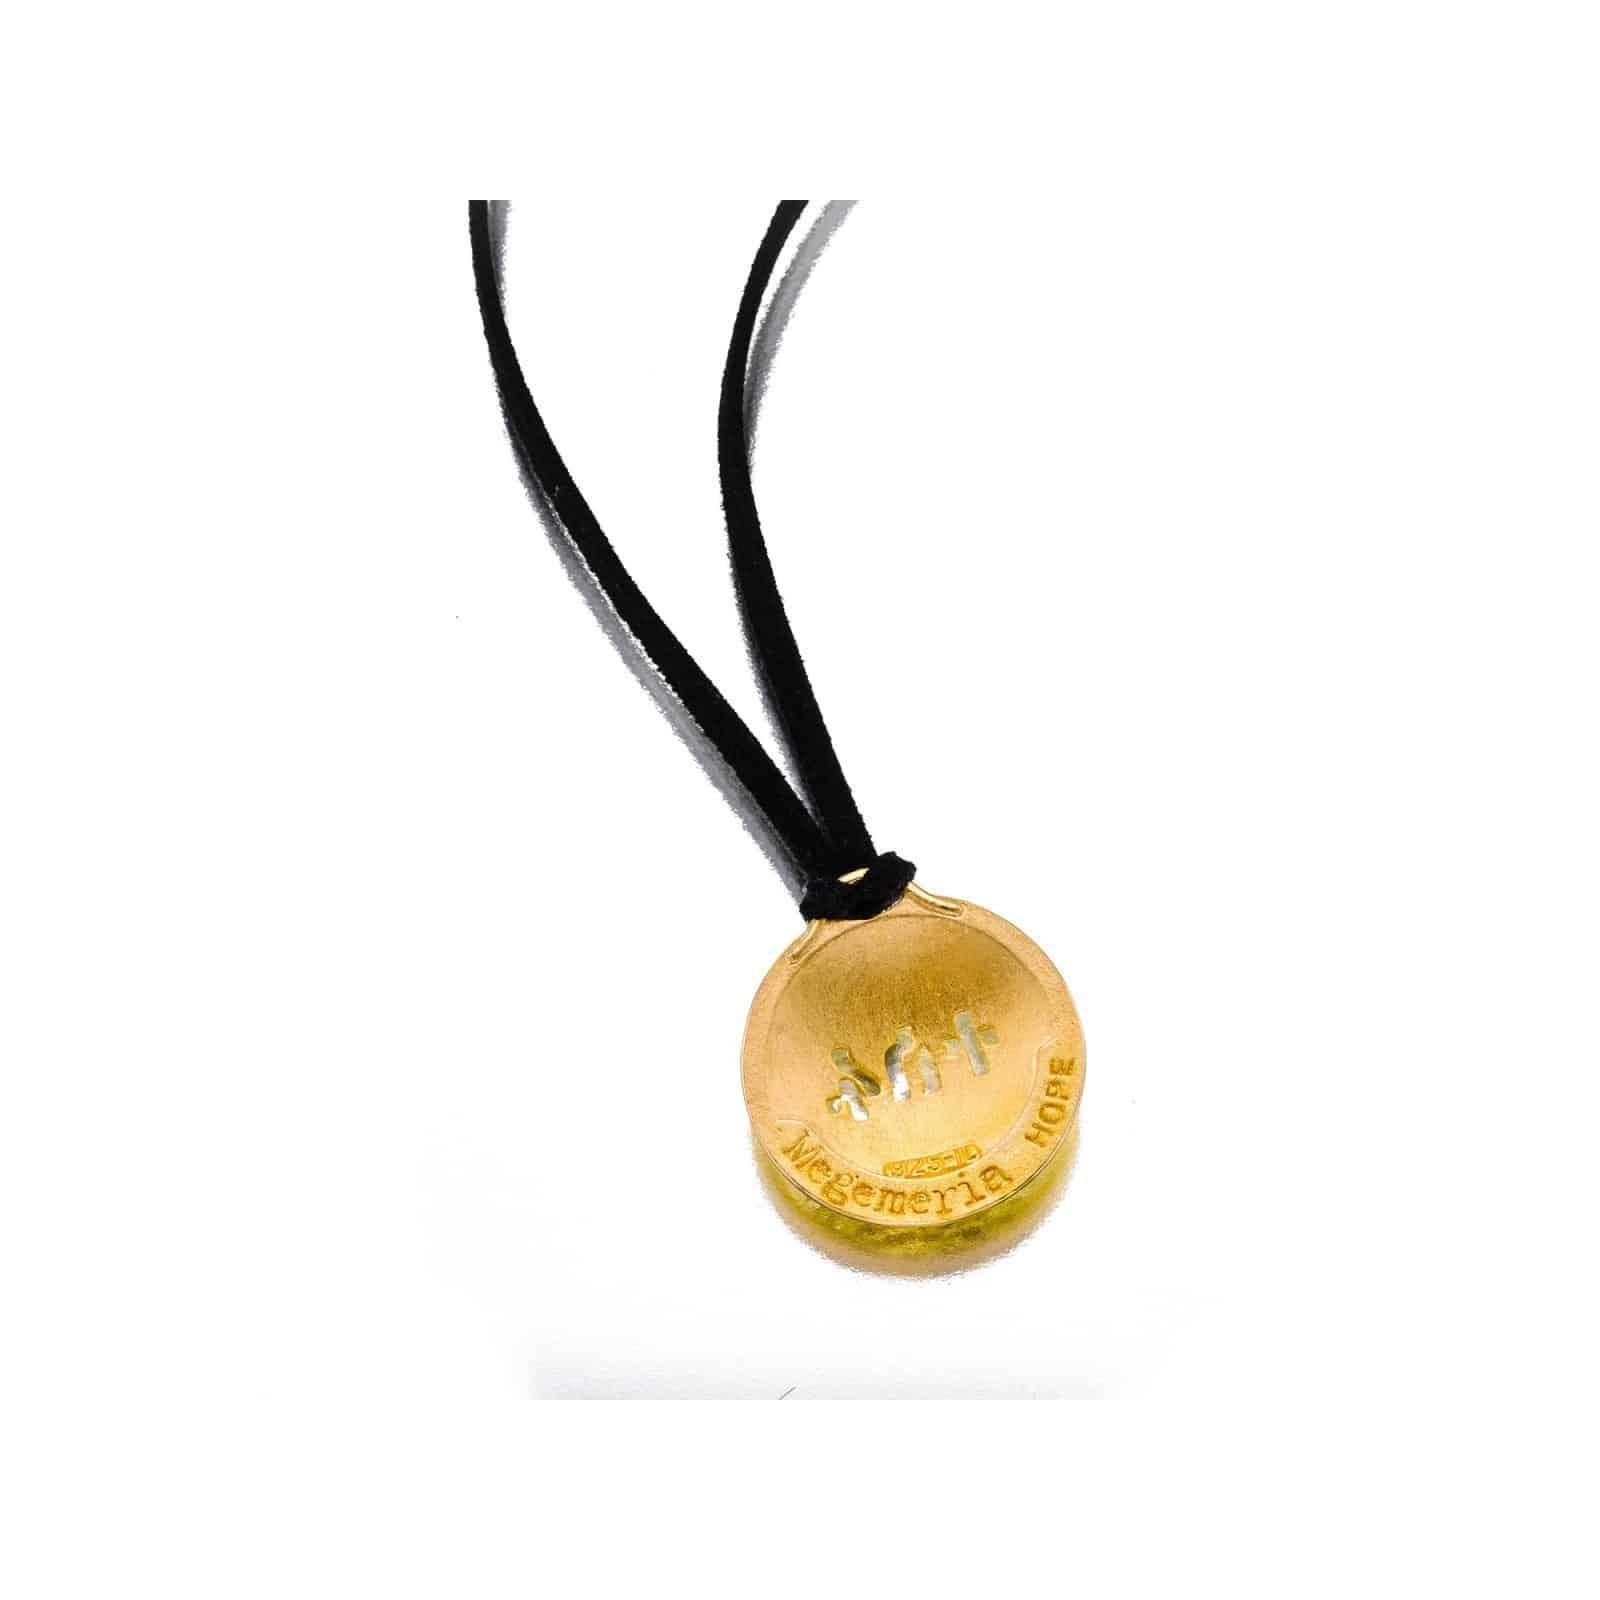 Colgante Aro de Oro con Cordón de Gamuza